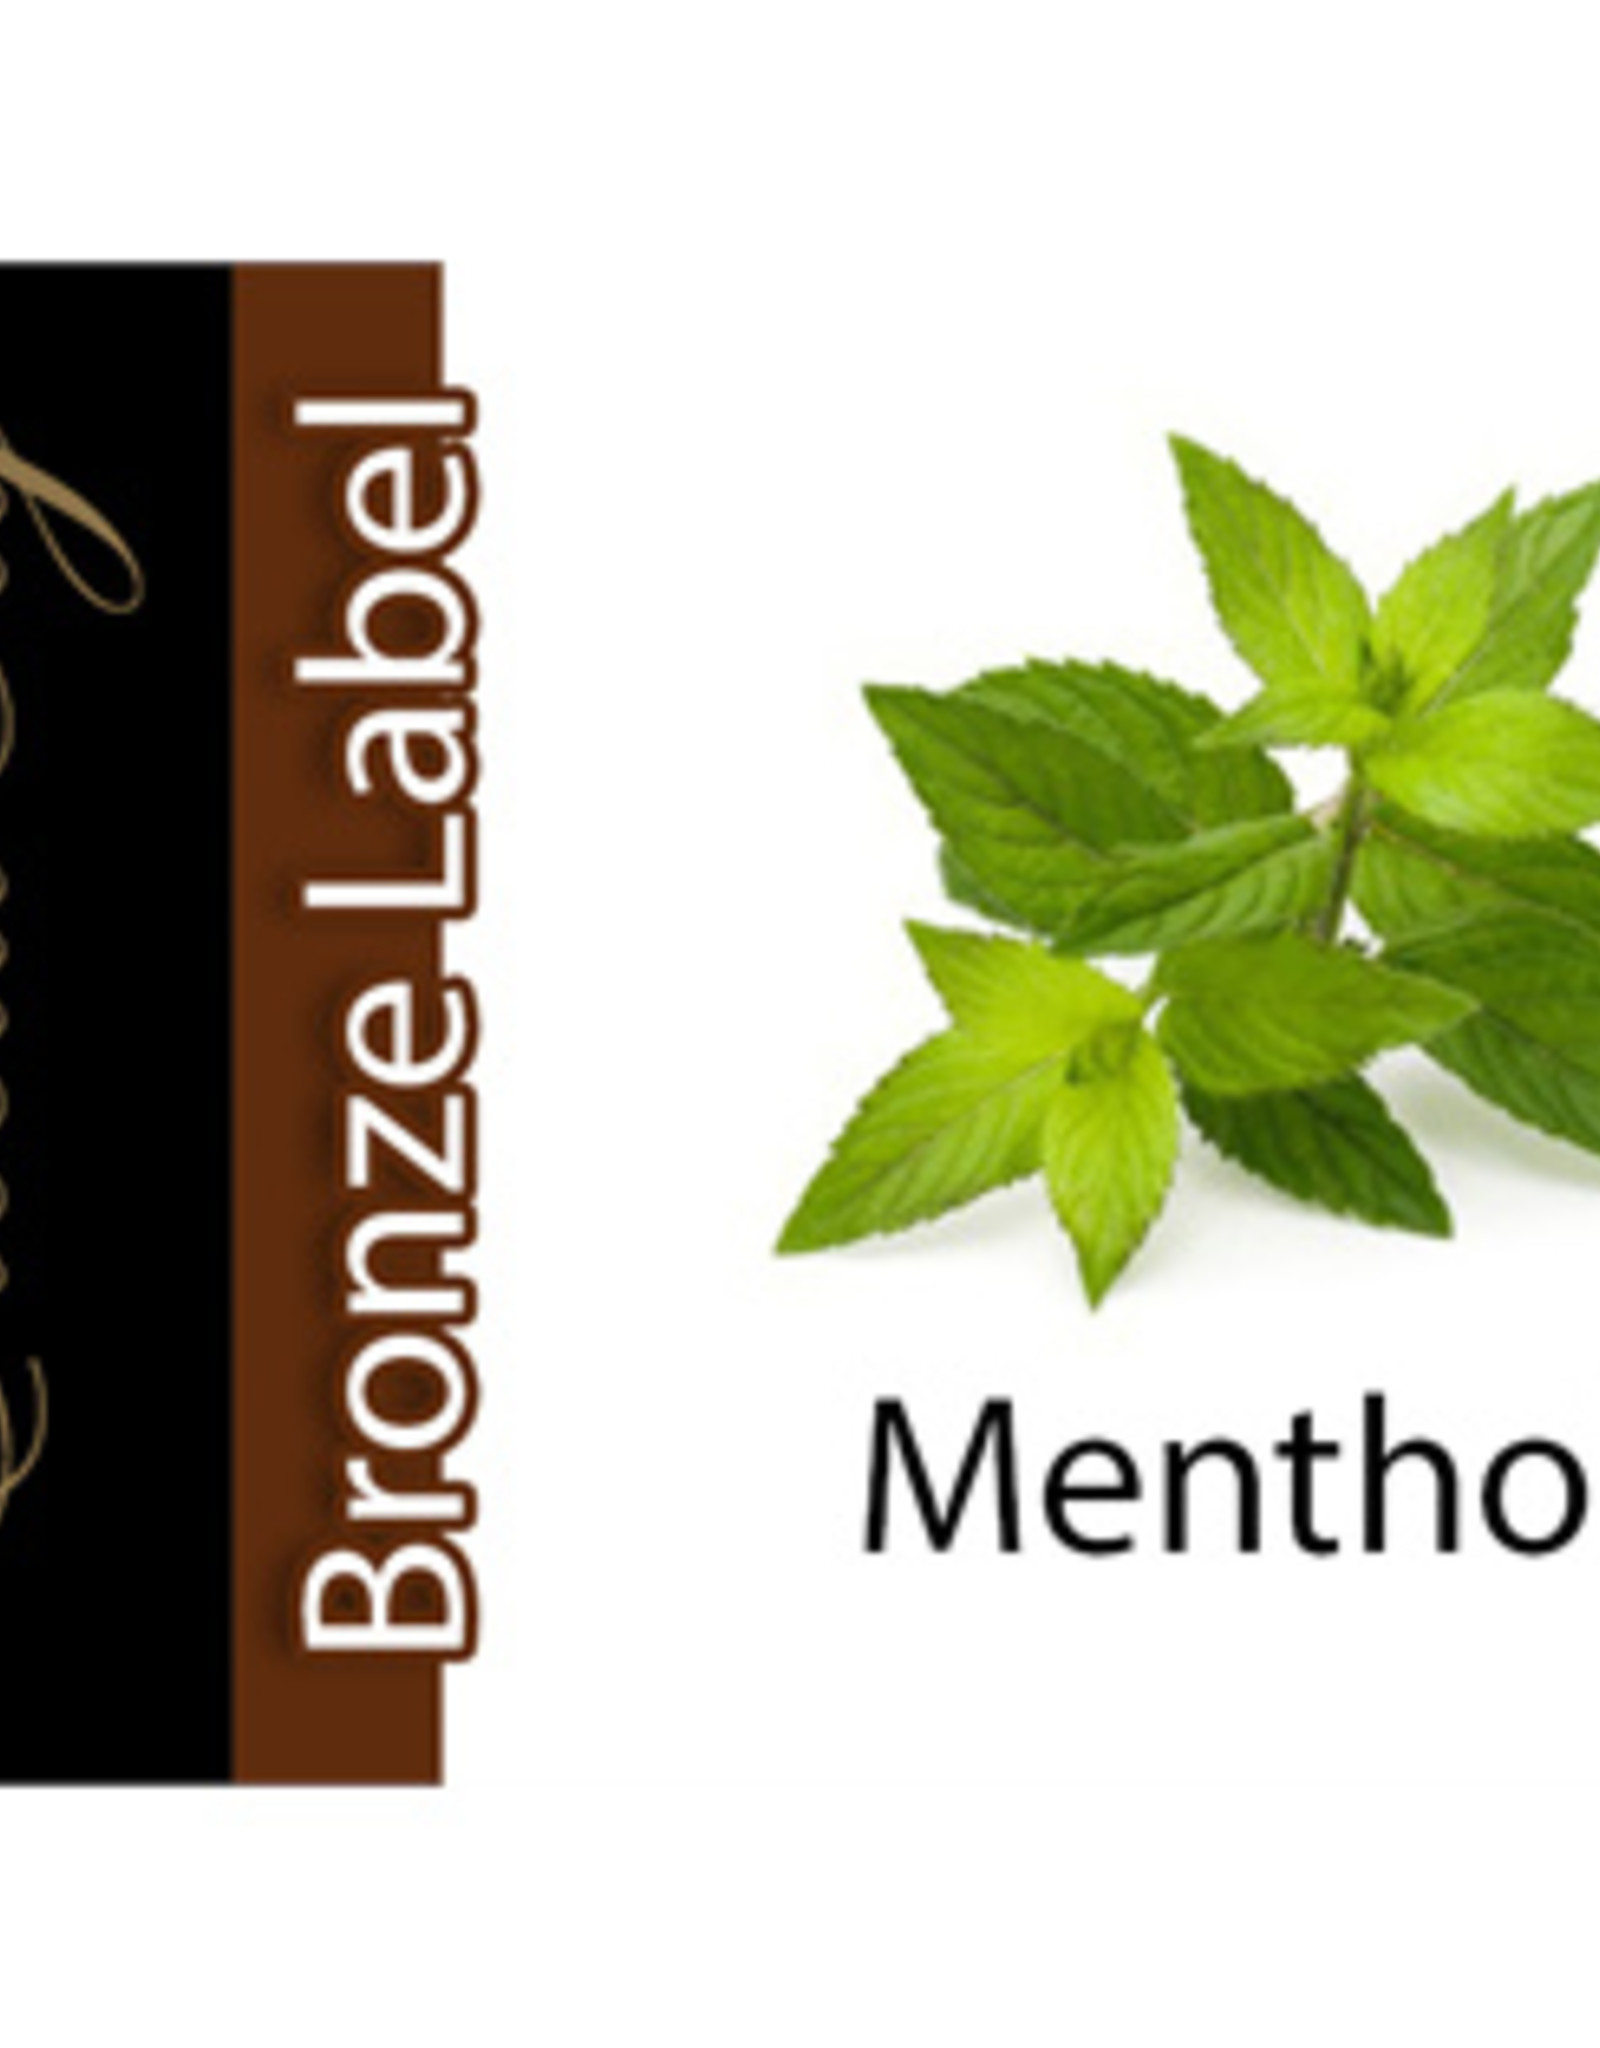 Exclucig Exclucig Bronze Label E-liquid Menthol 6 mg Nicotine